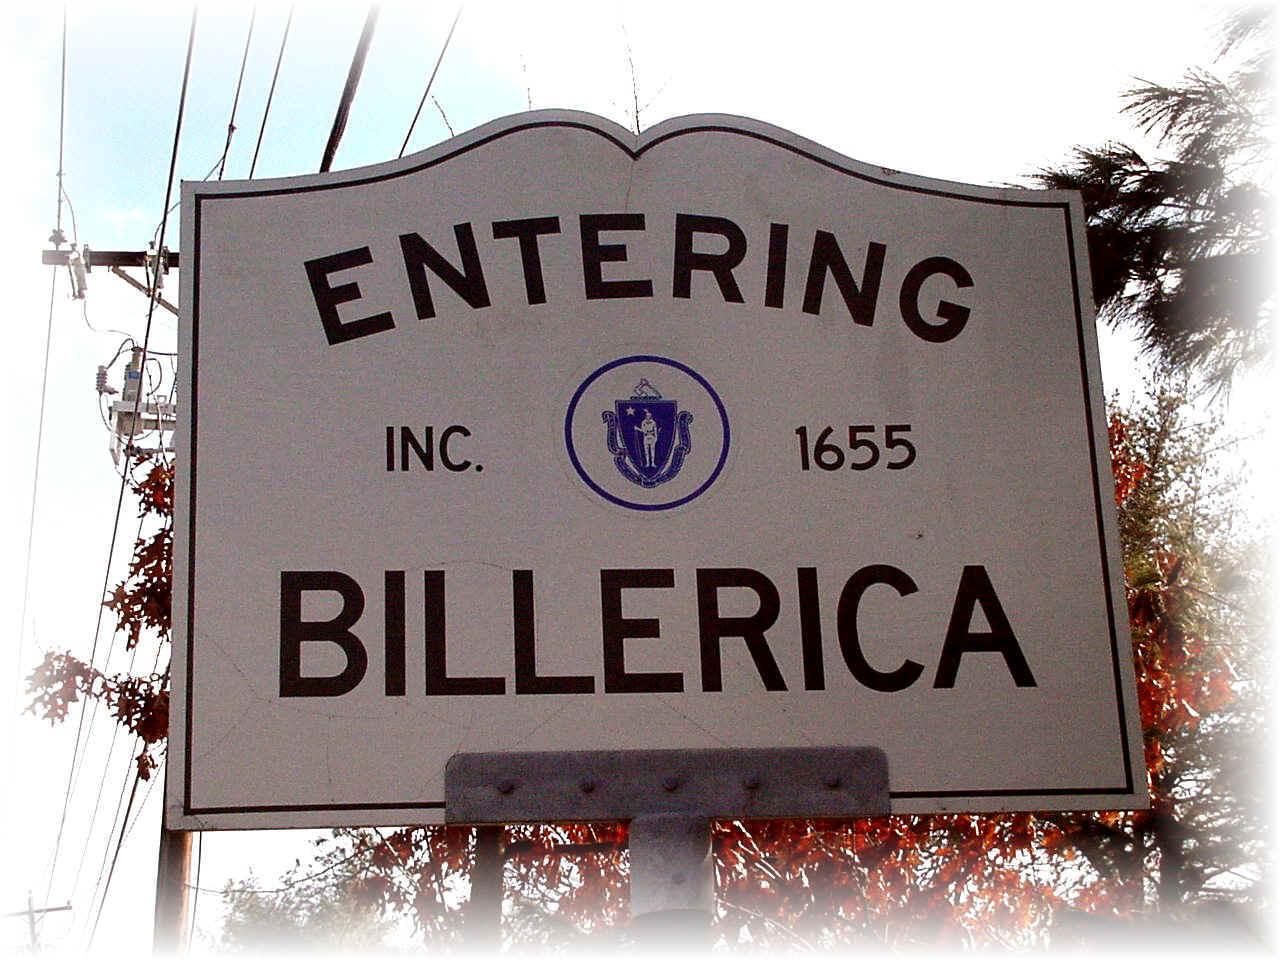 Entering Billerica MA